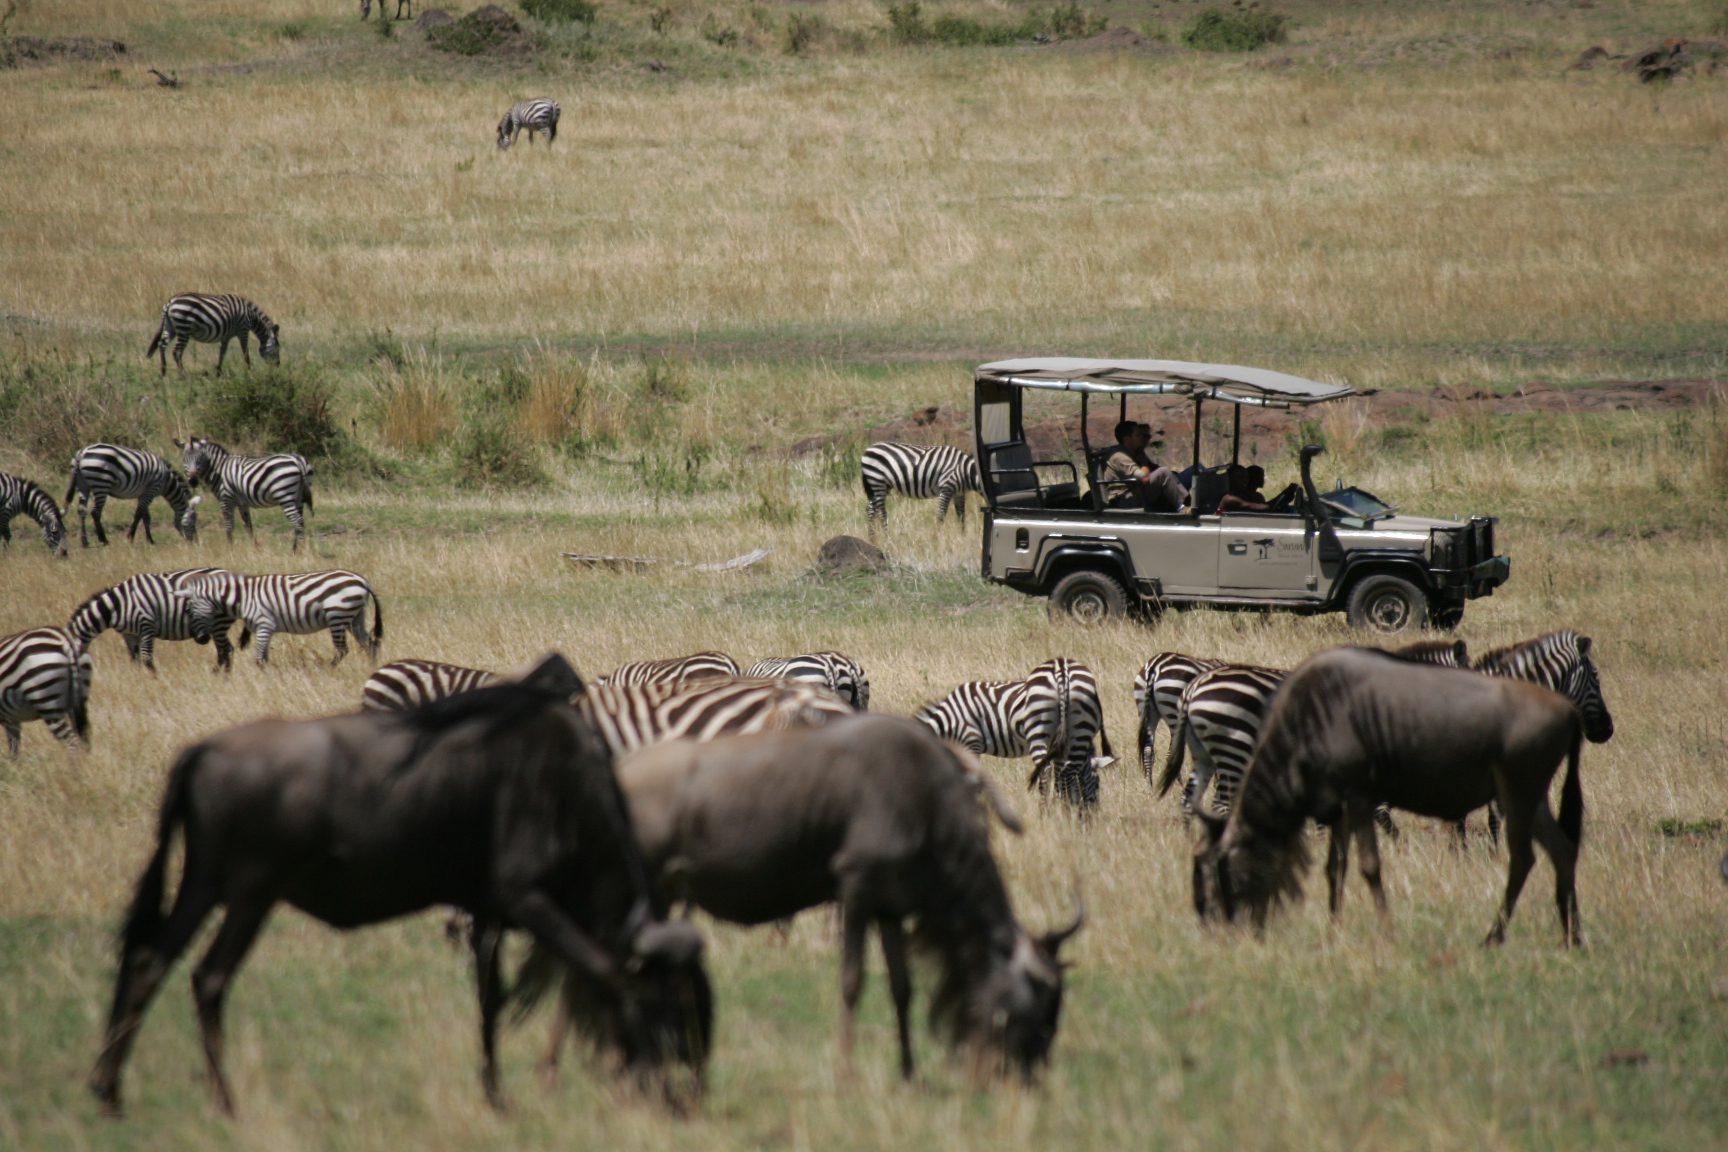 Wildebeest and Zebra in the Maasai Mara